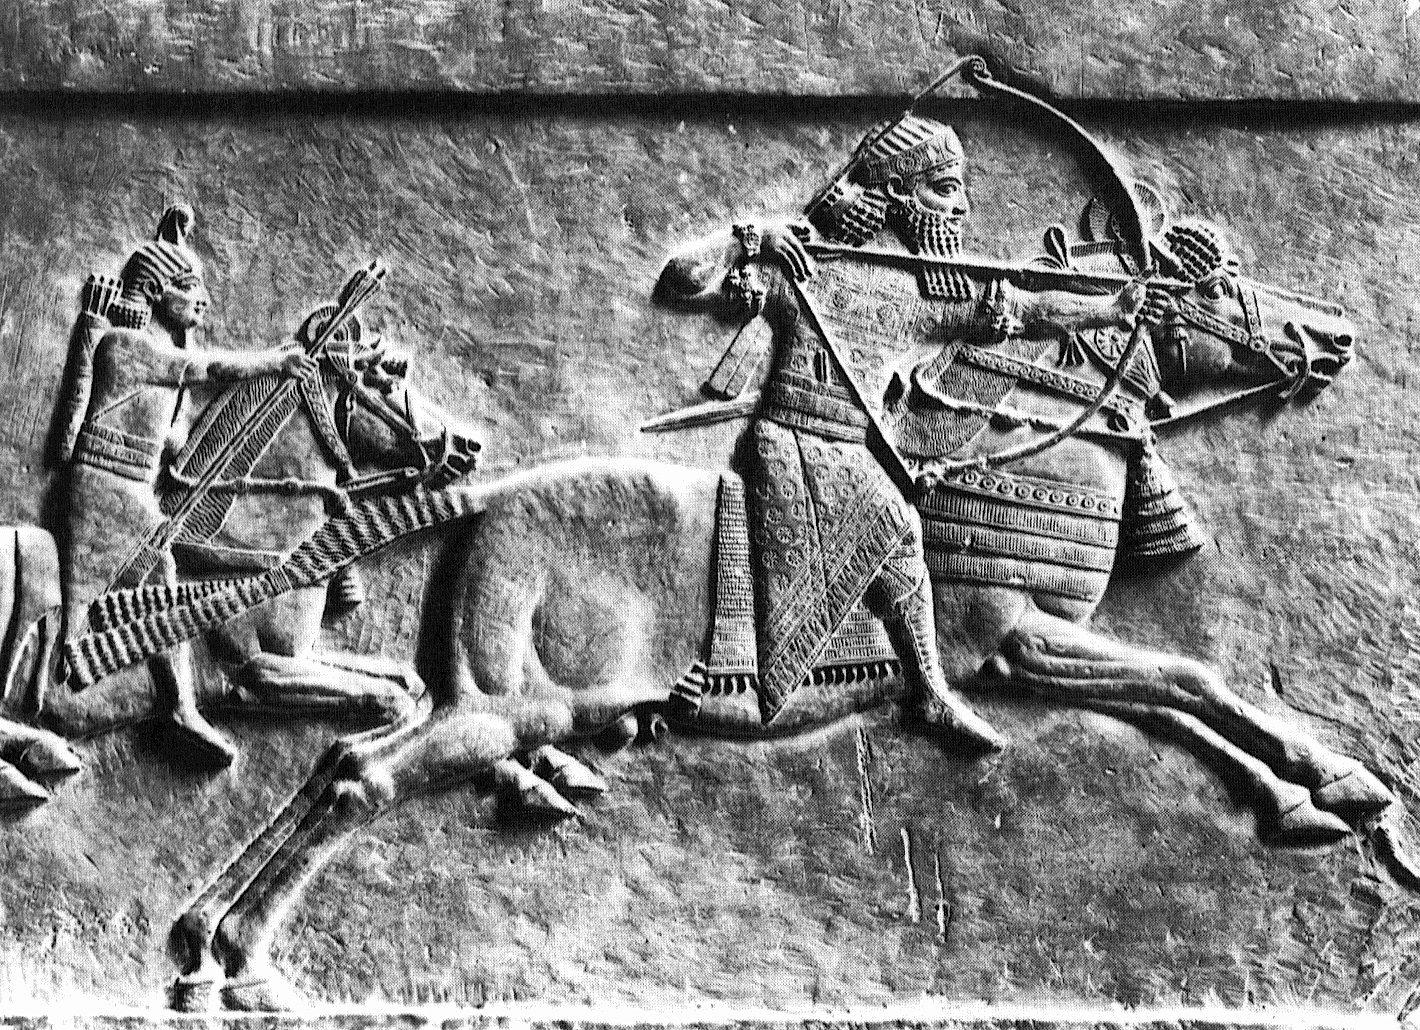 Google Image Result for http://daughterofthewind.org/wp-content/uploads/2010/02/Assyrian_Horse_Archer.jpg